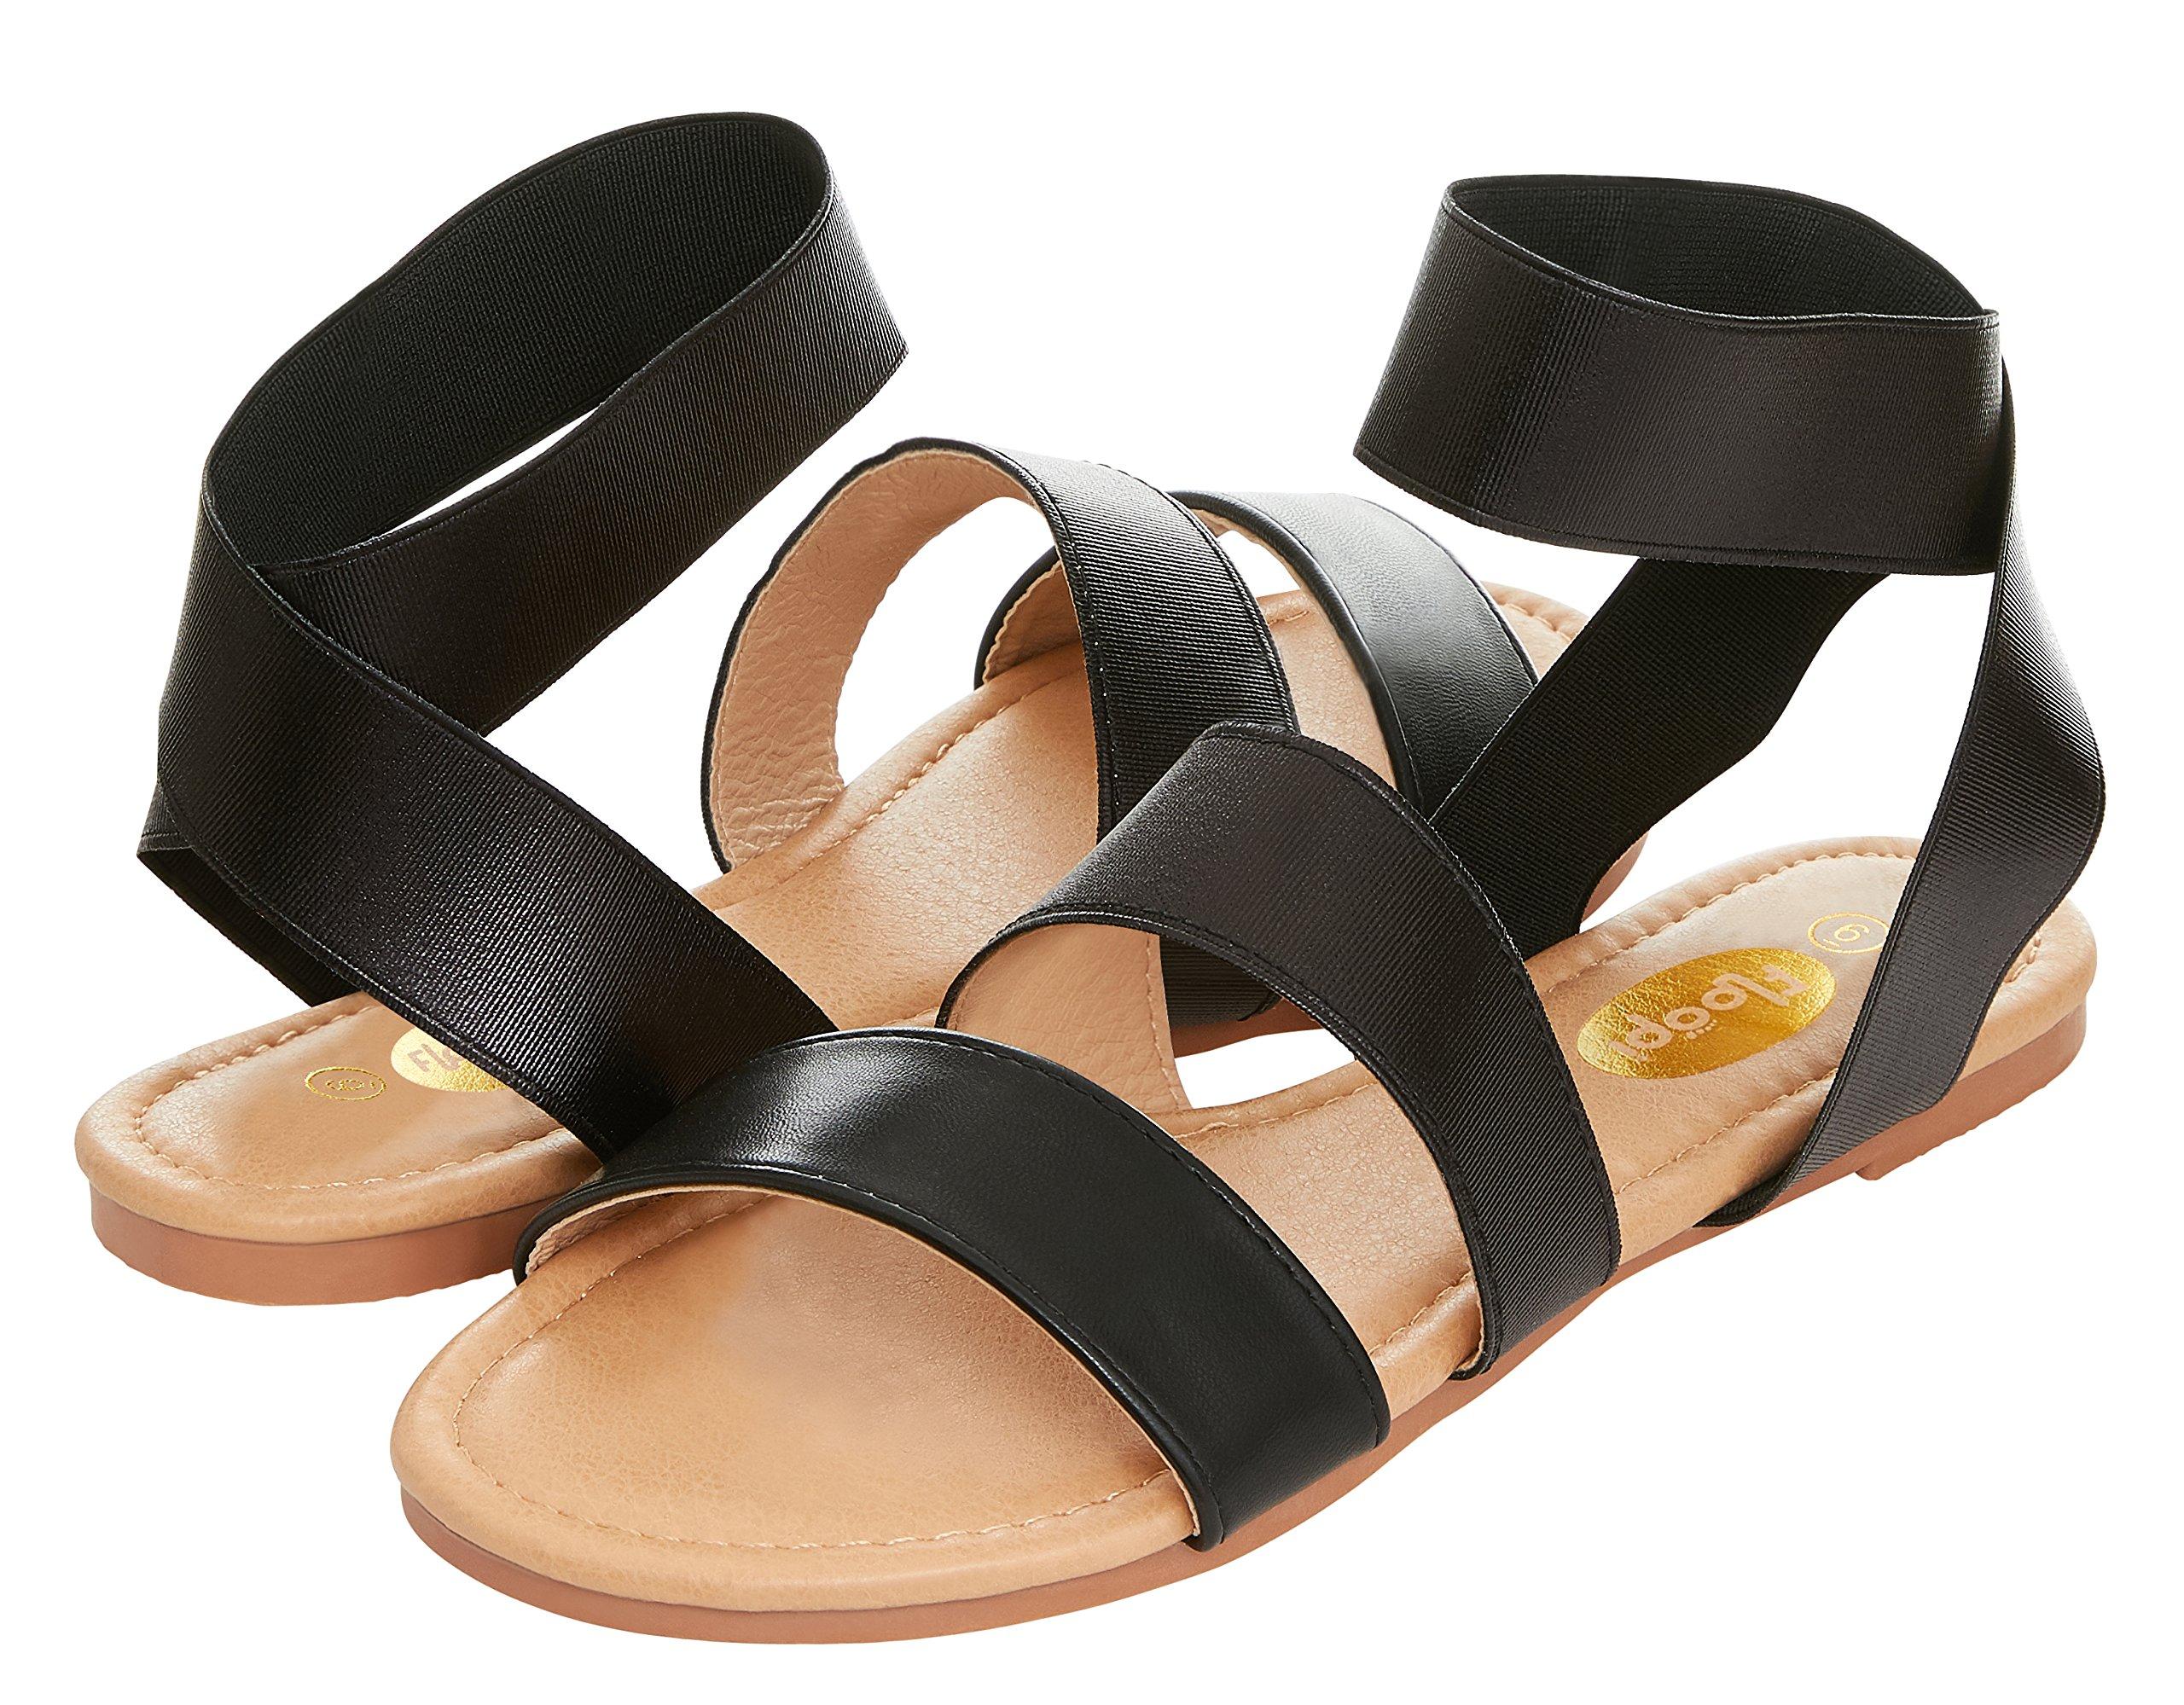 Floopi Womens Summer Elastic Ankle Strap Gladiator Strappy Flat Sandal (9, Black-506)